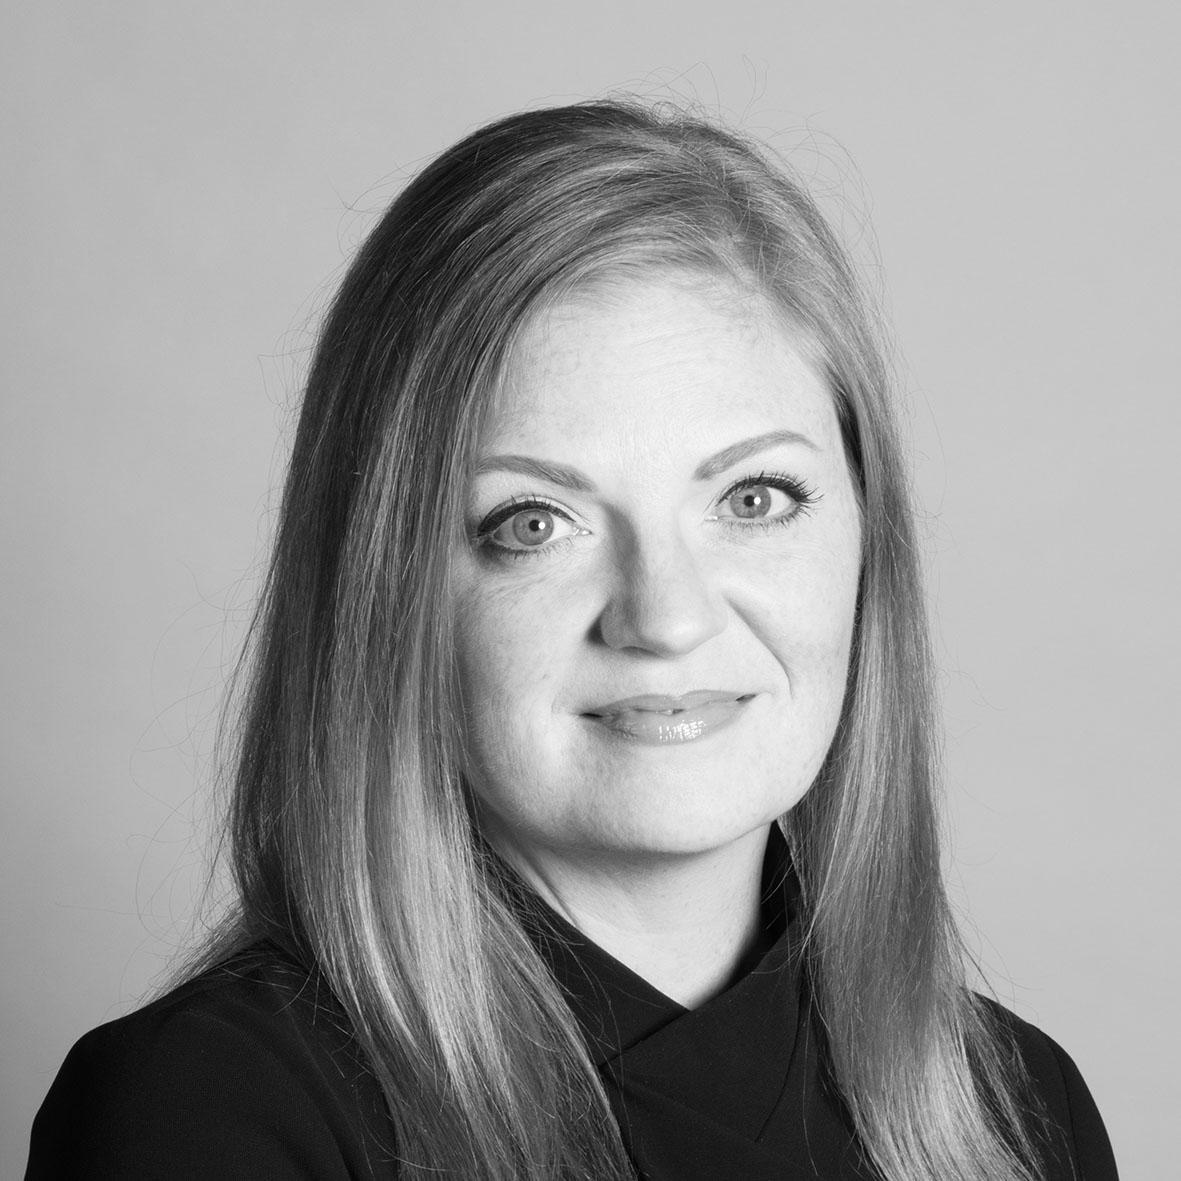 Sophie Cosper